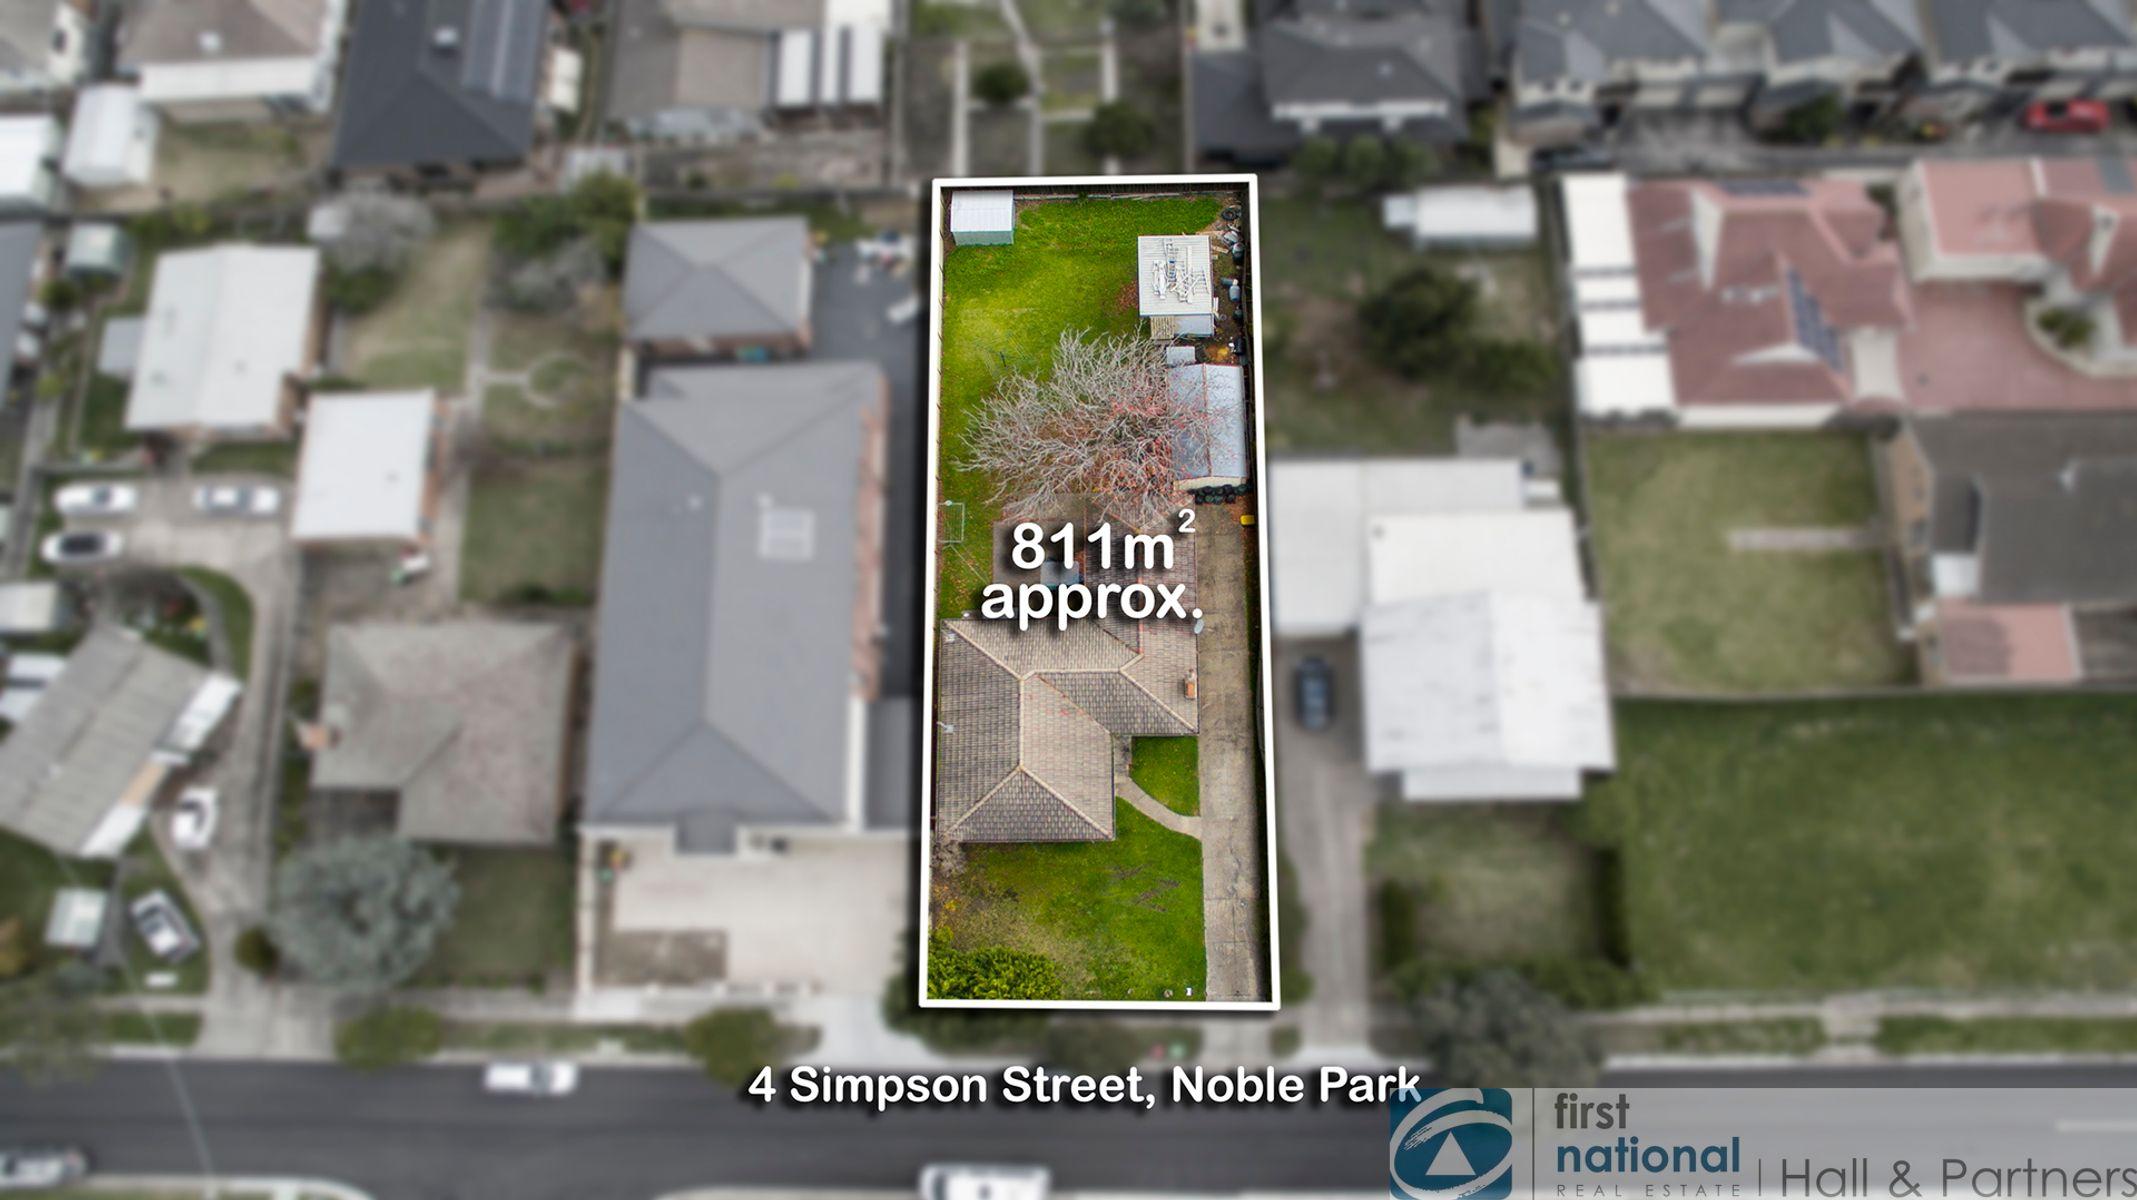 4 Simpson Street, Noble Park, VIC 3174